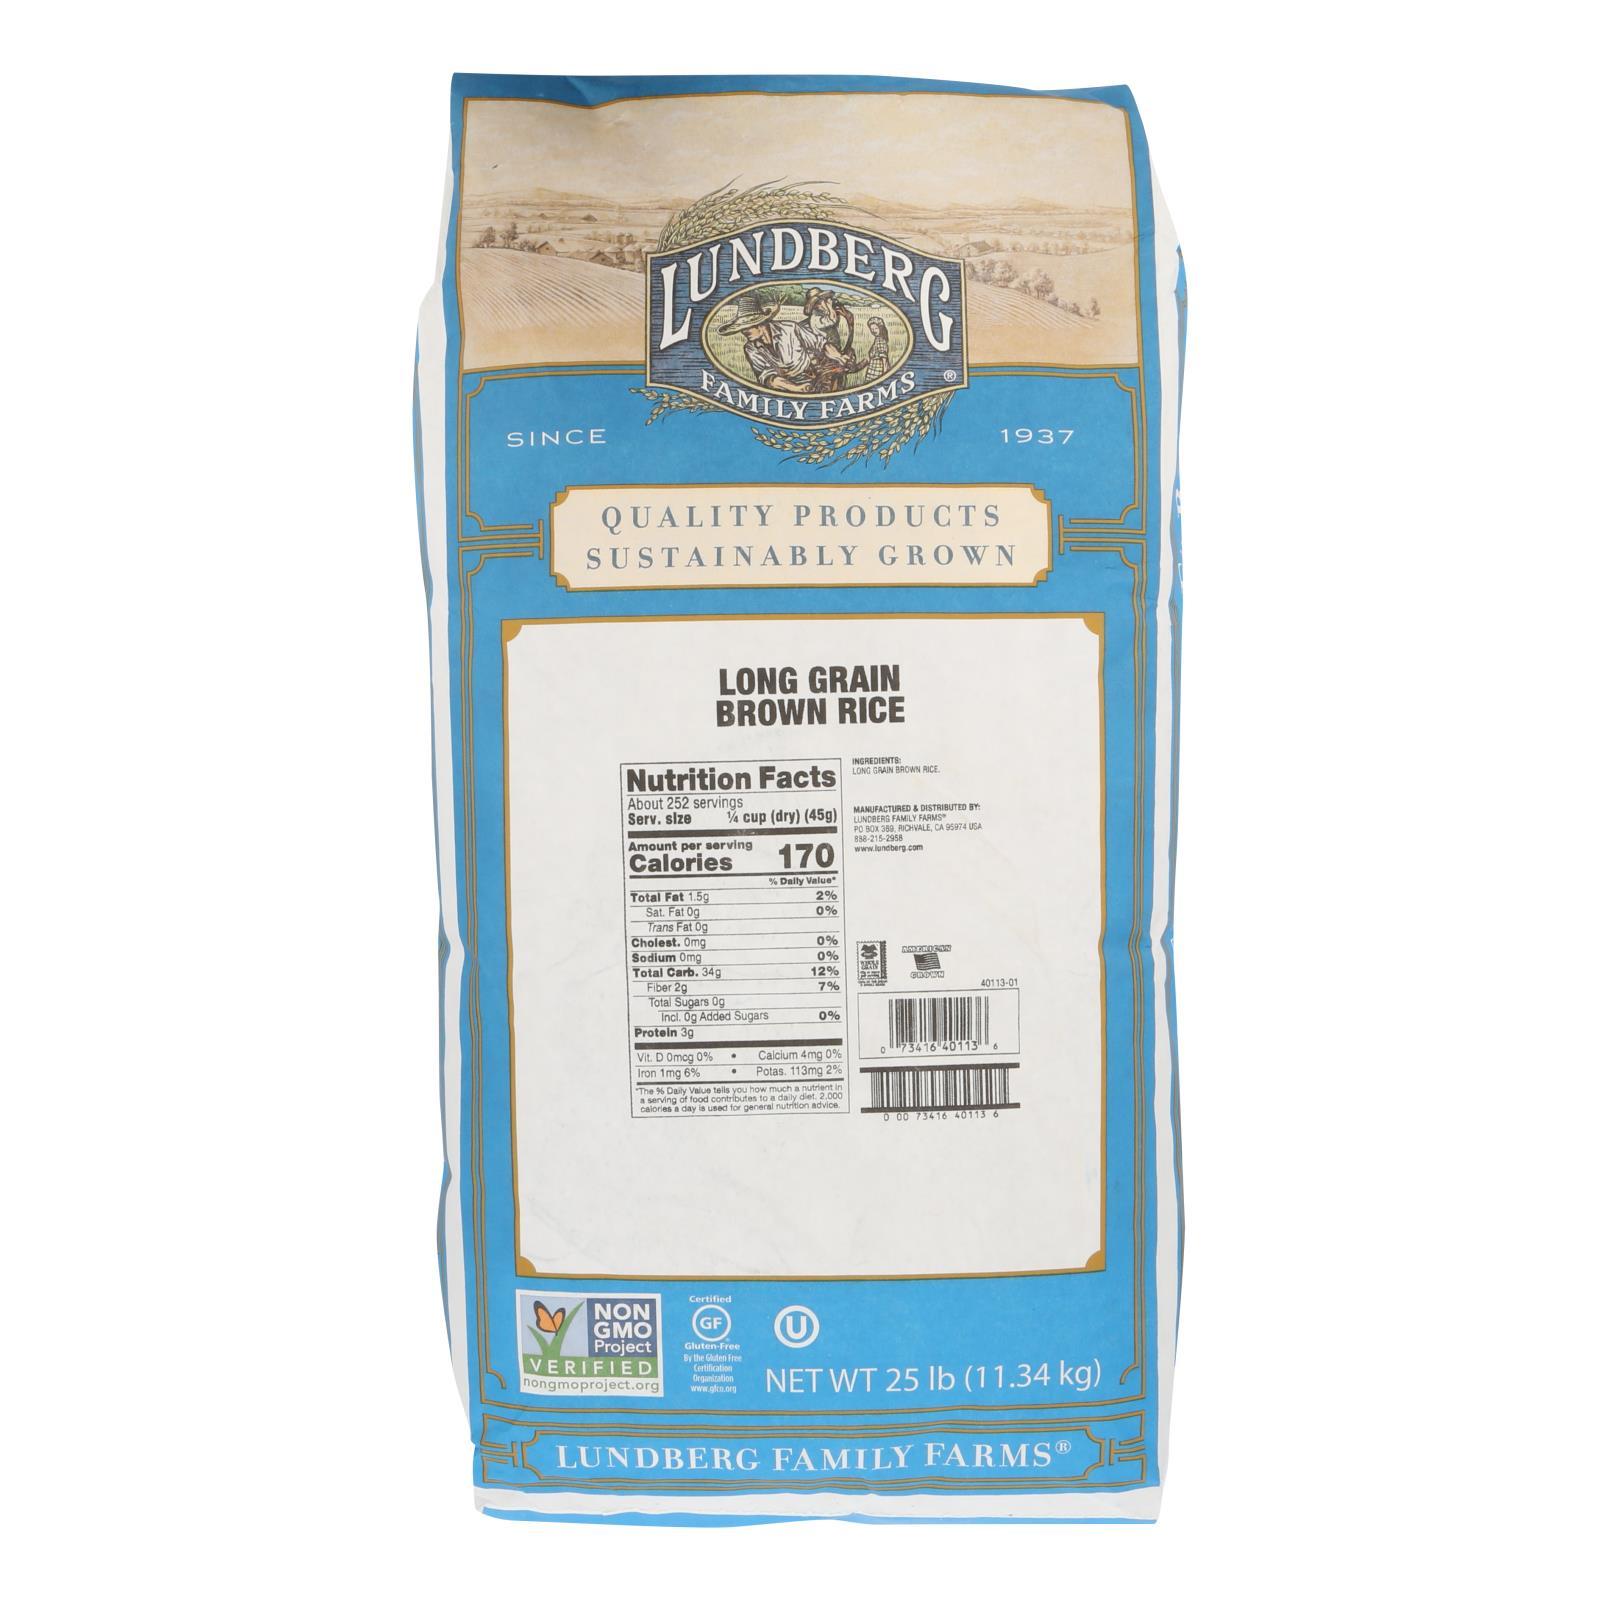 Lundberg Family Farms Eco - Farmed Long Grain Brown Rice - Case of 25 lbs %count(alt)